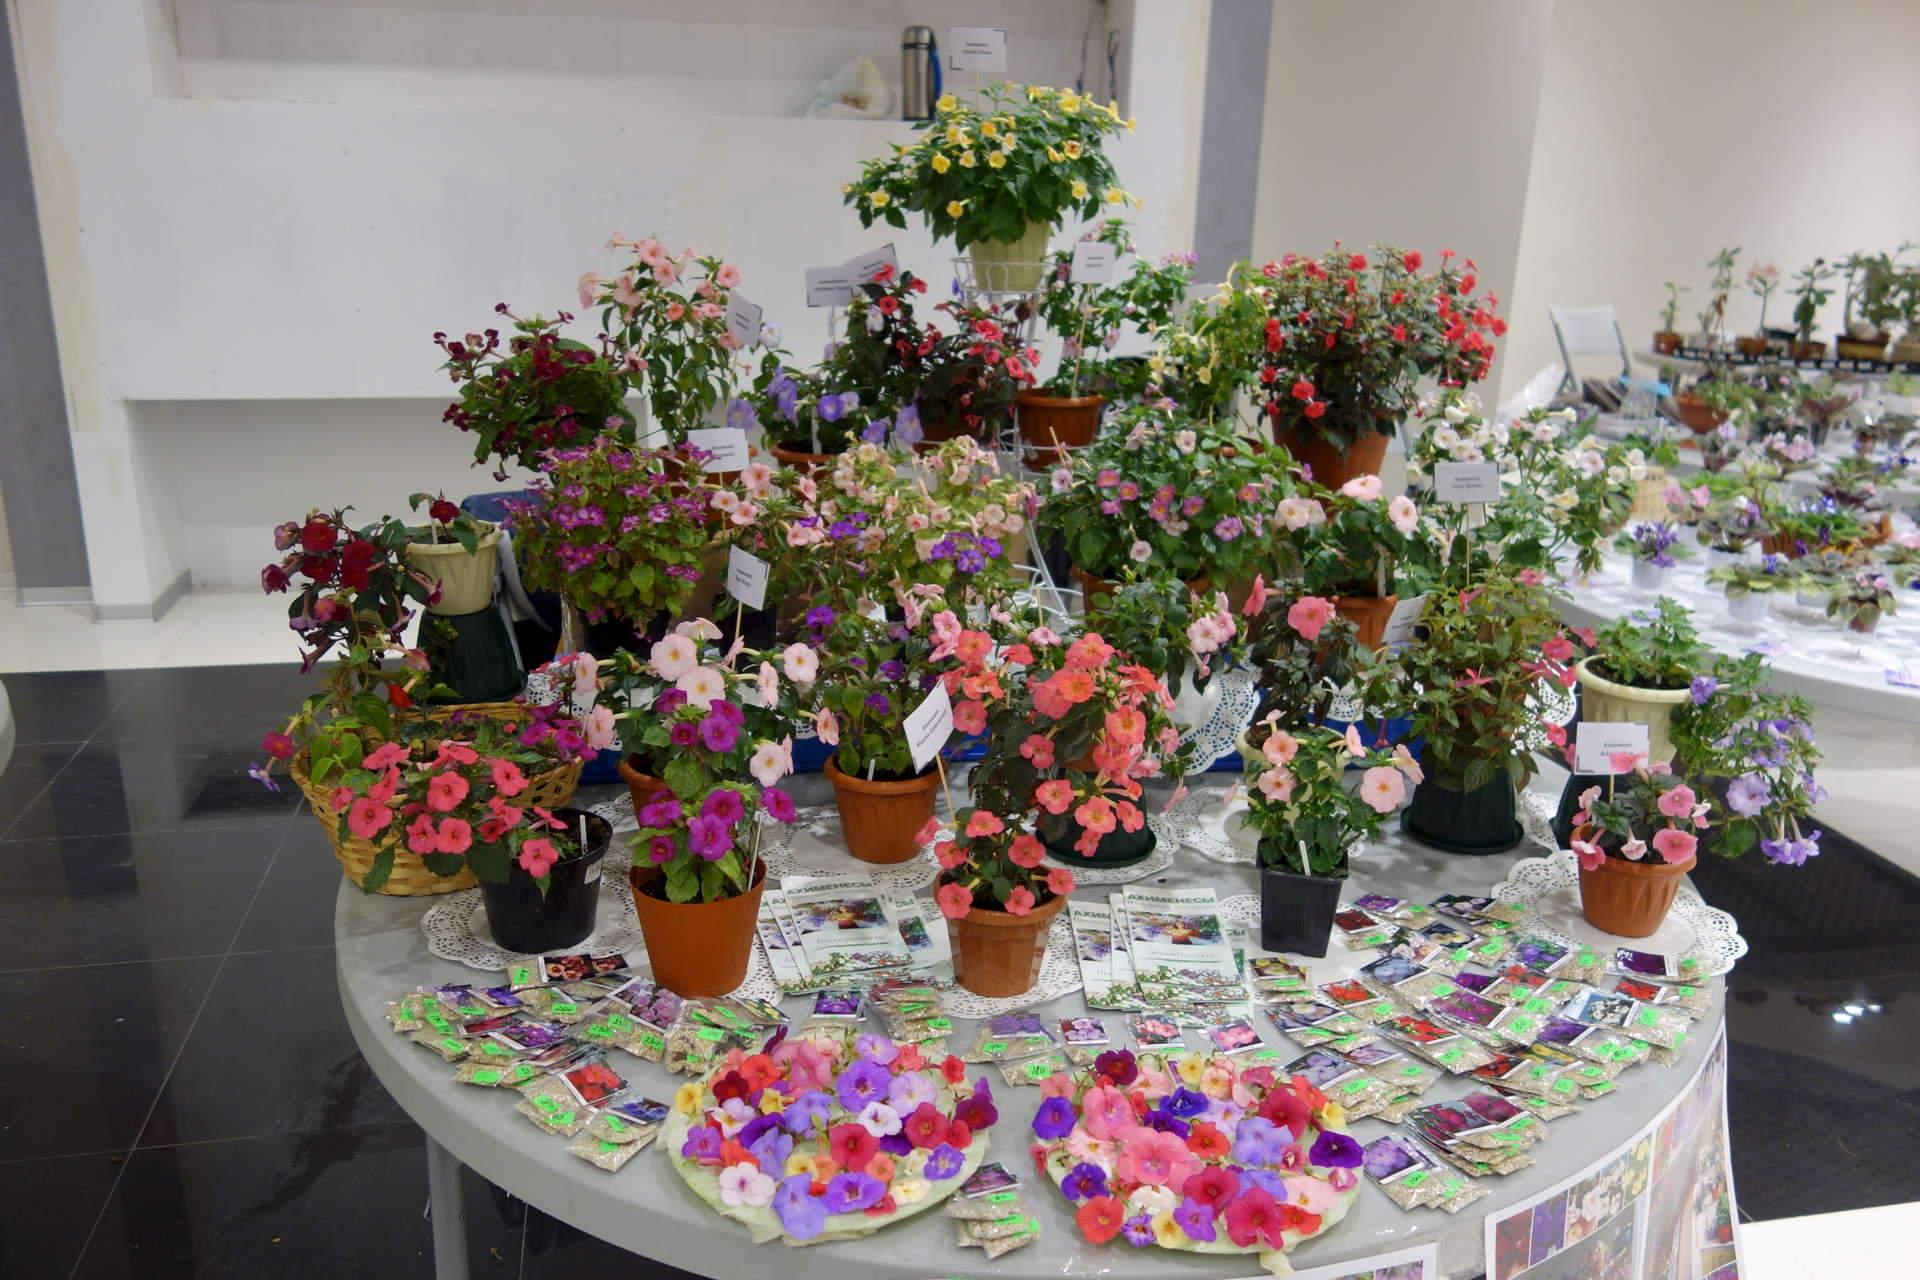 Оптом цветы на заказ екатеринбург уралмаш, цветы для